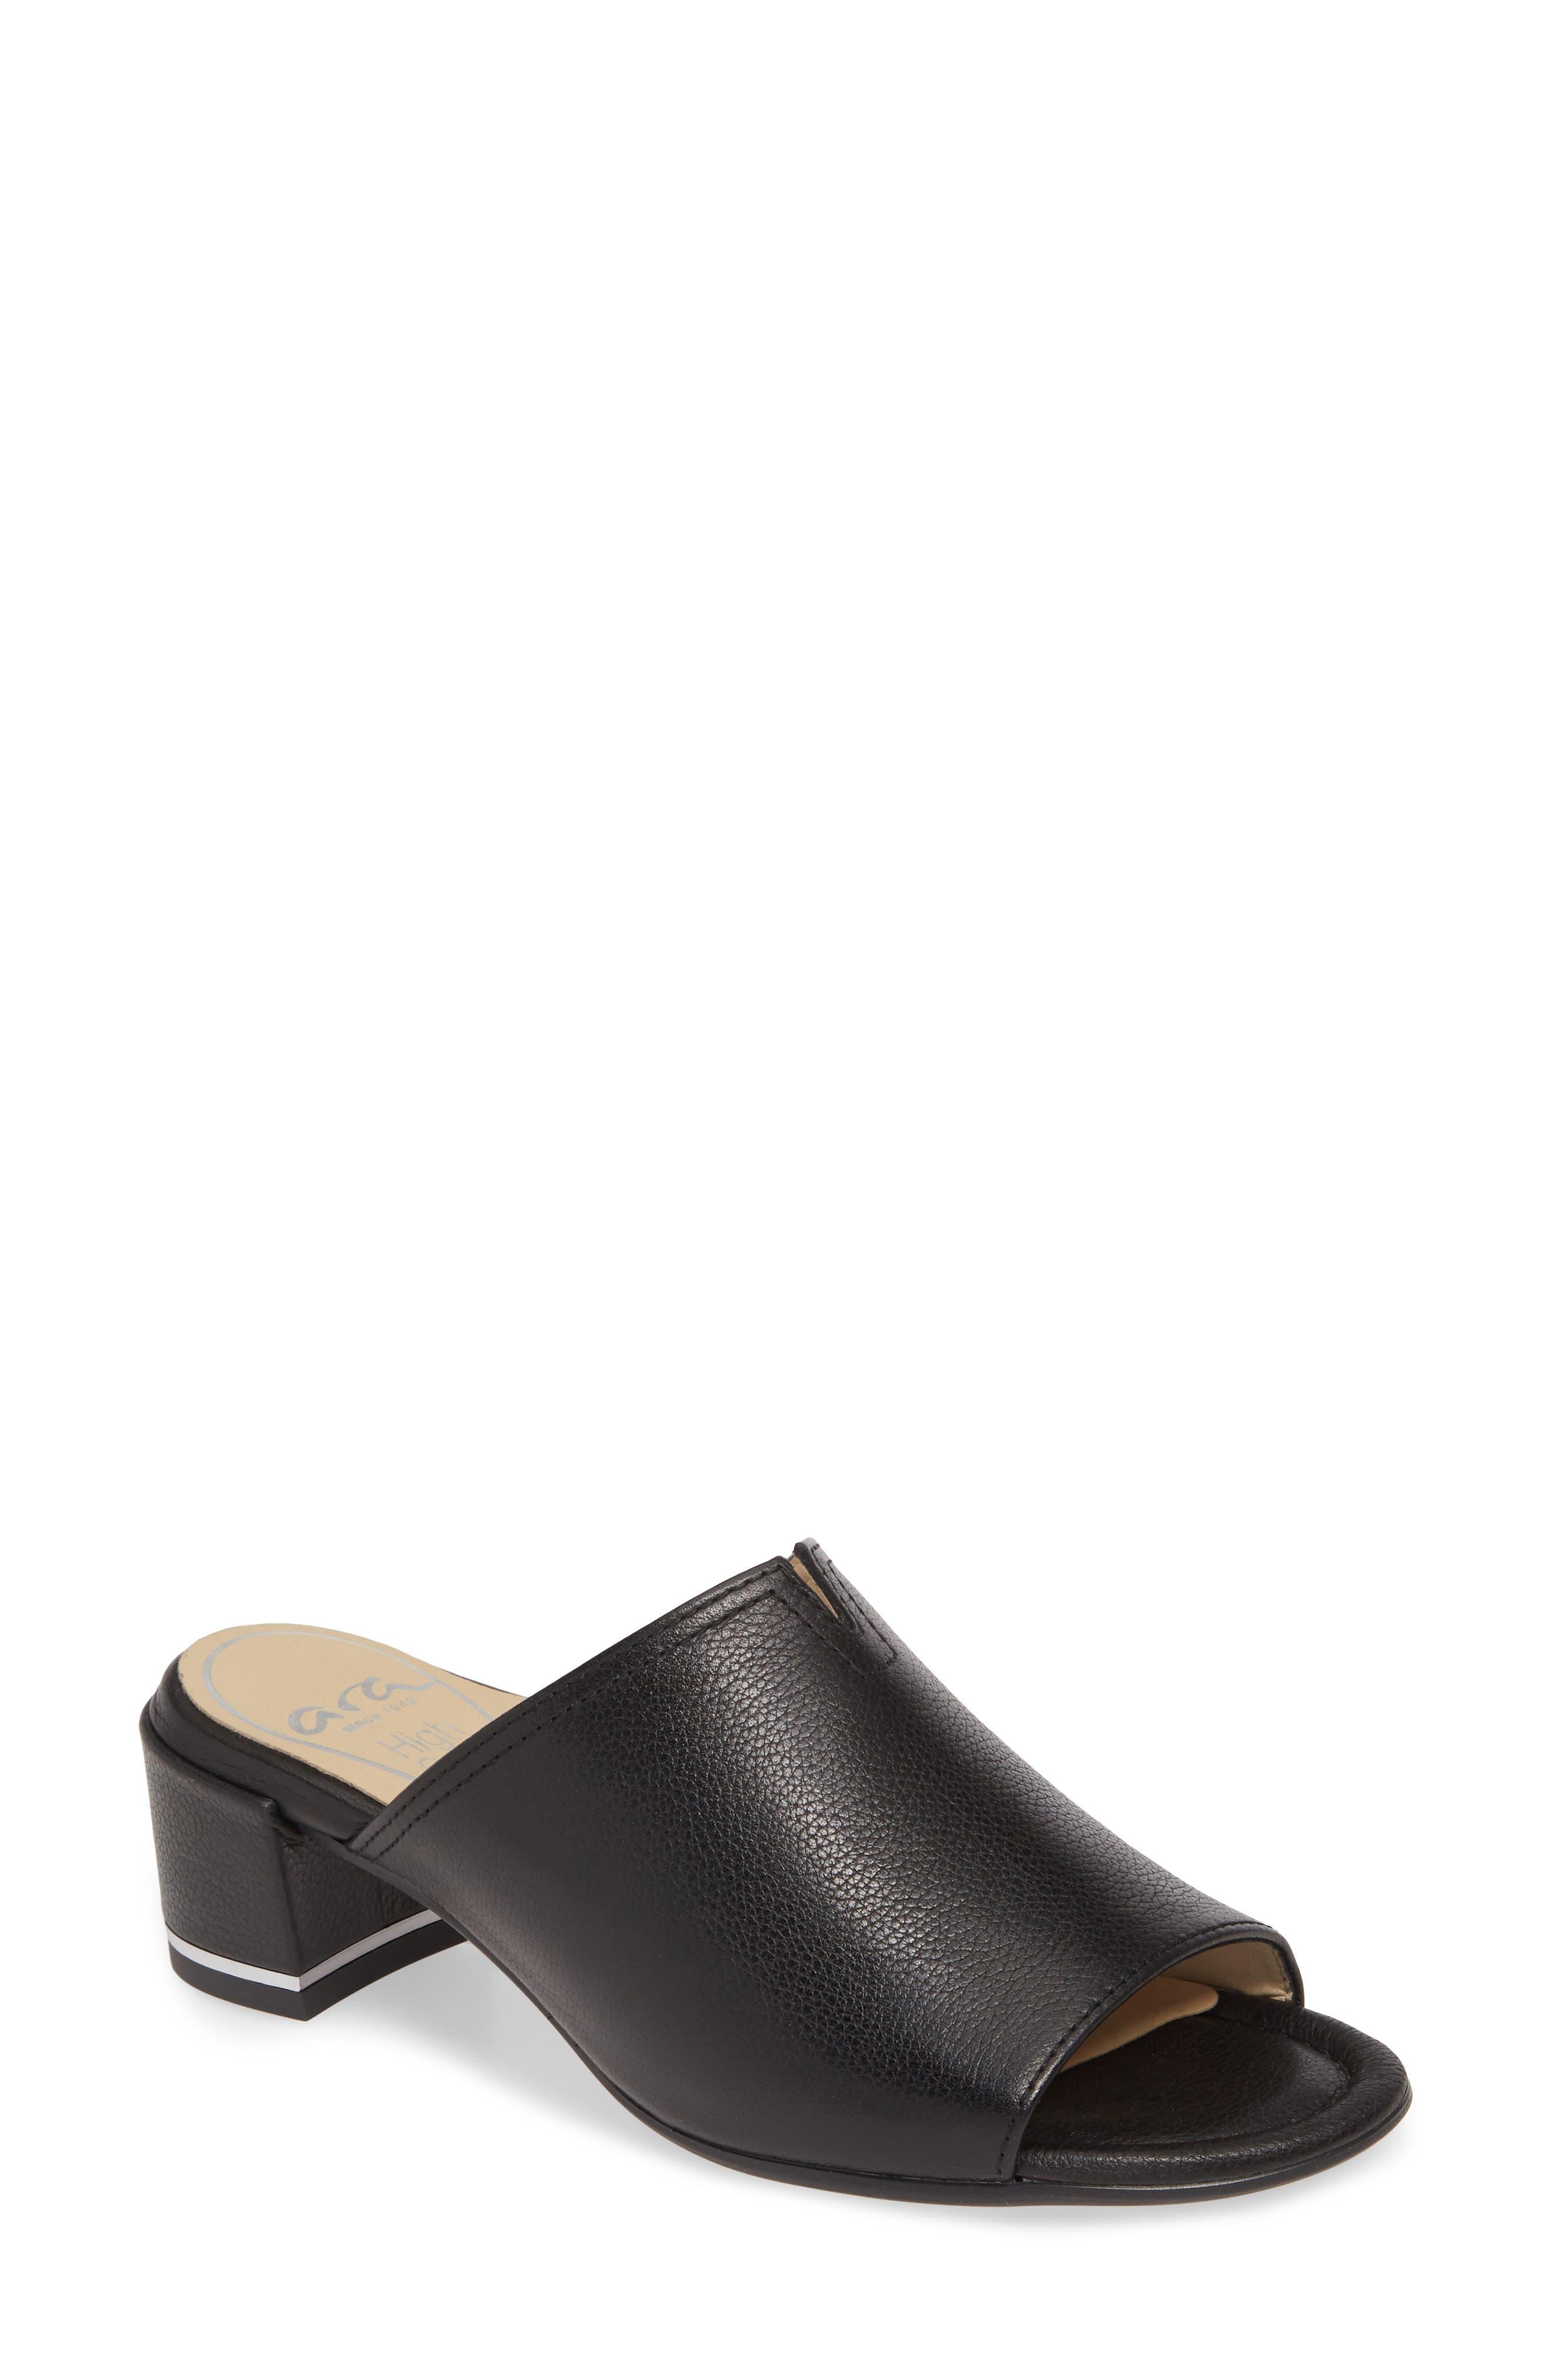 Gerty Notch Vamp Slide Sandal